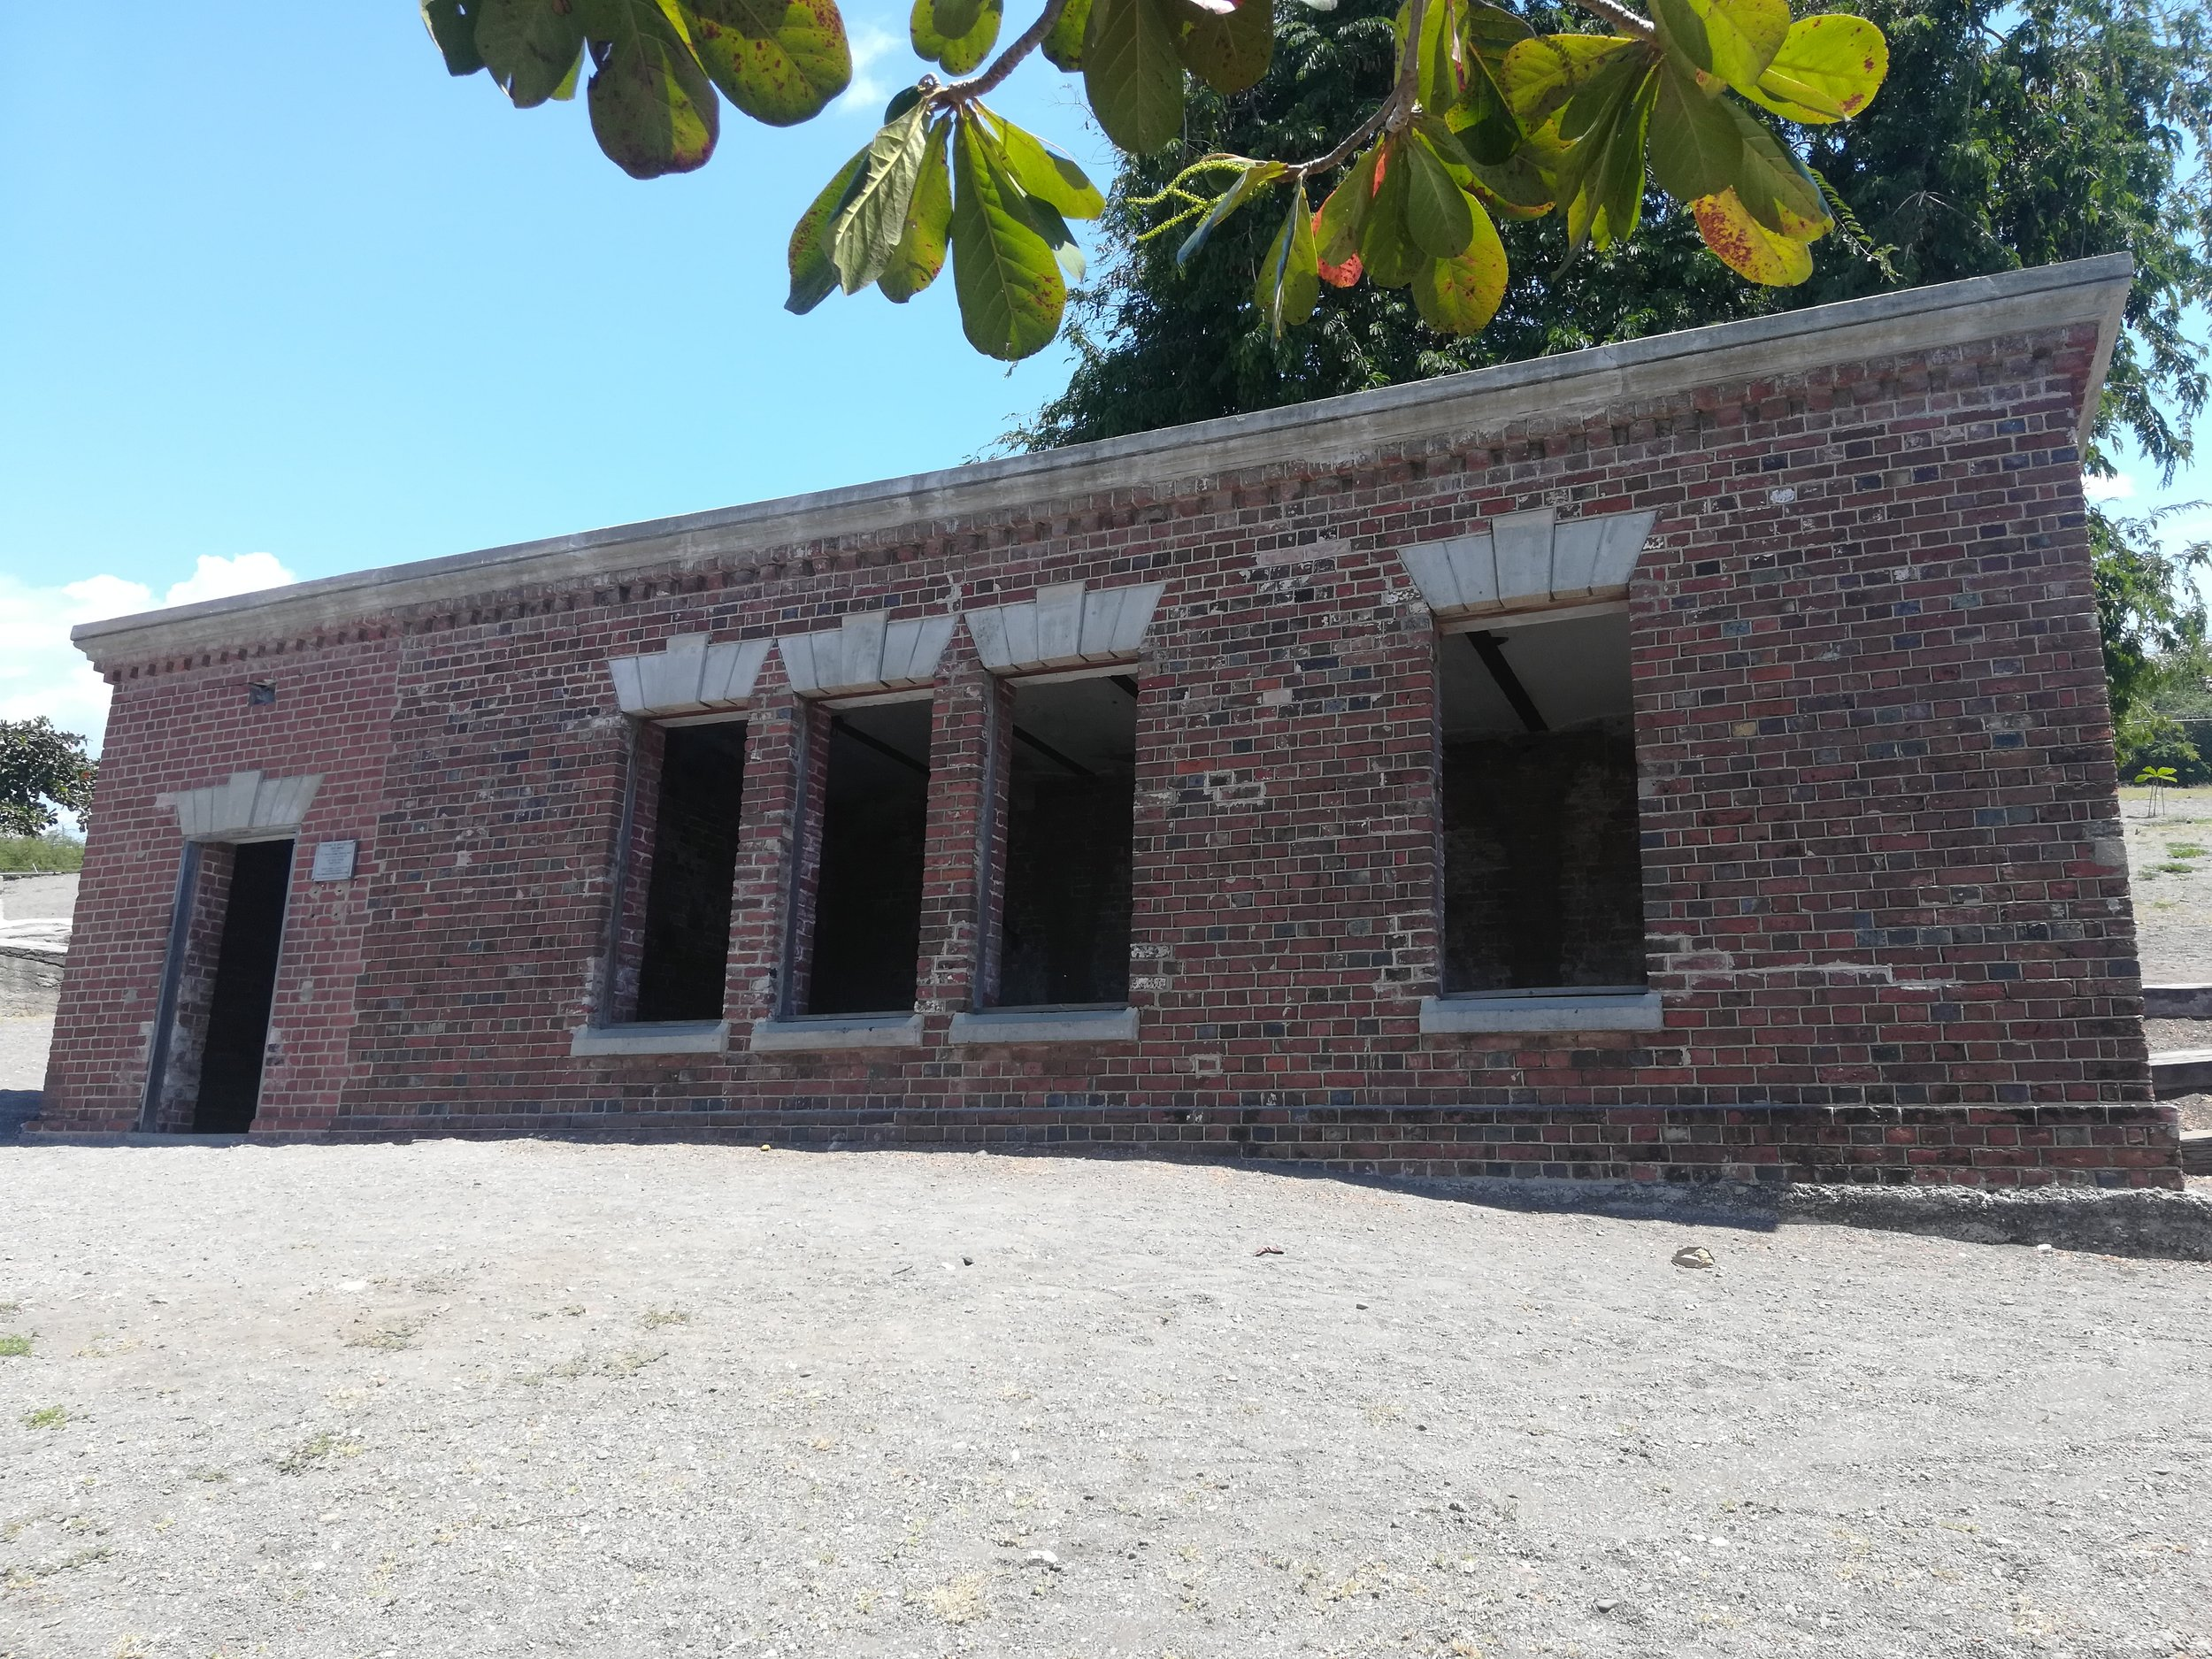 Giddy House Fort Charles, Port Royal